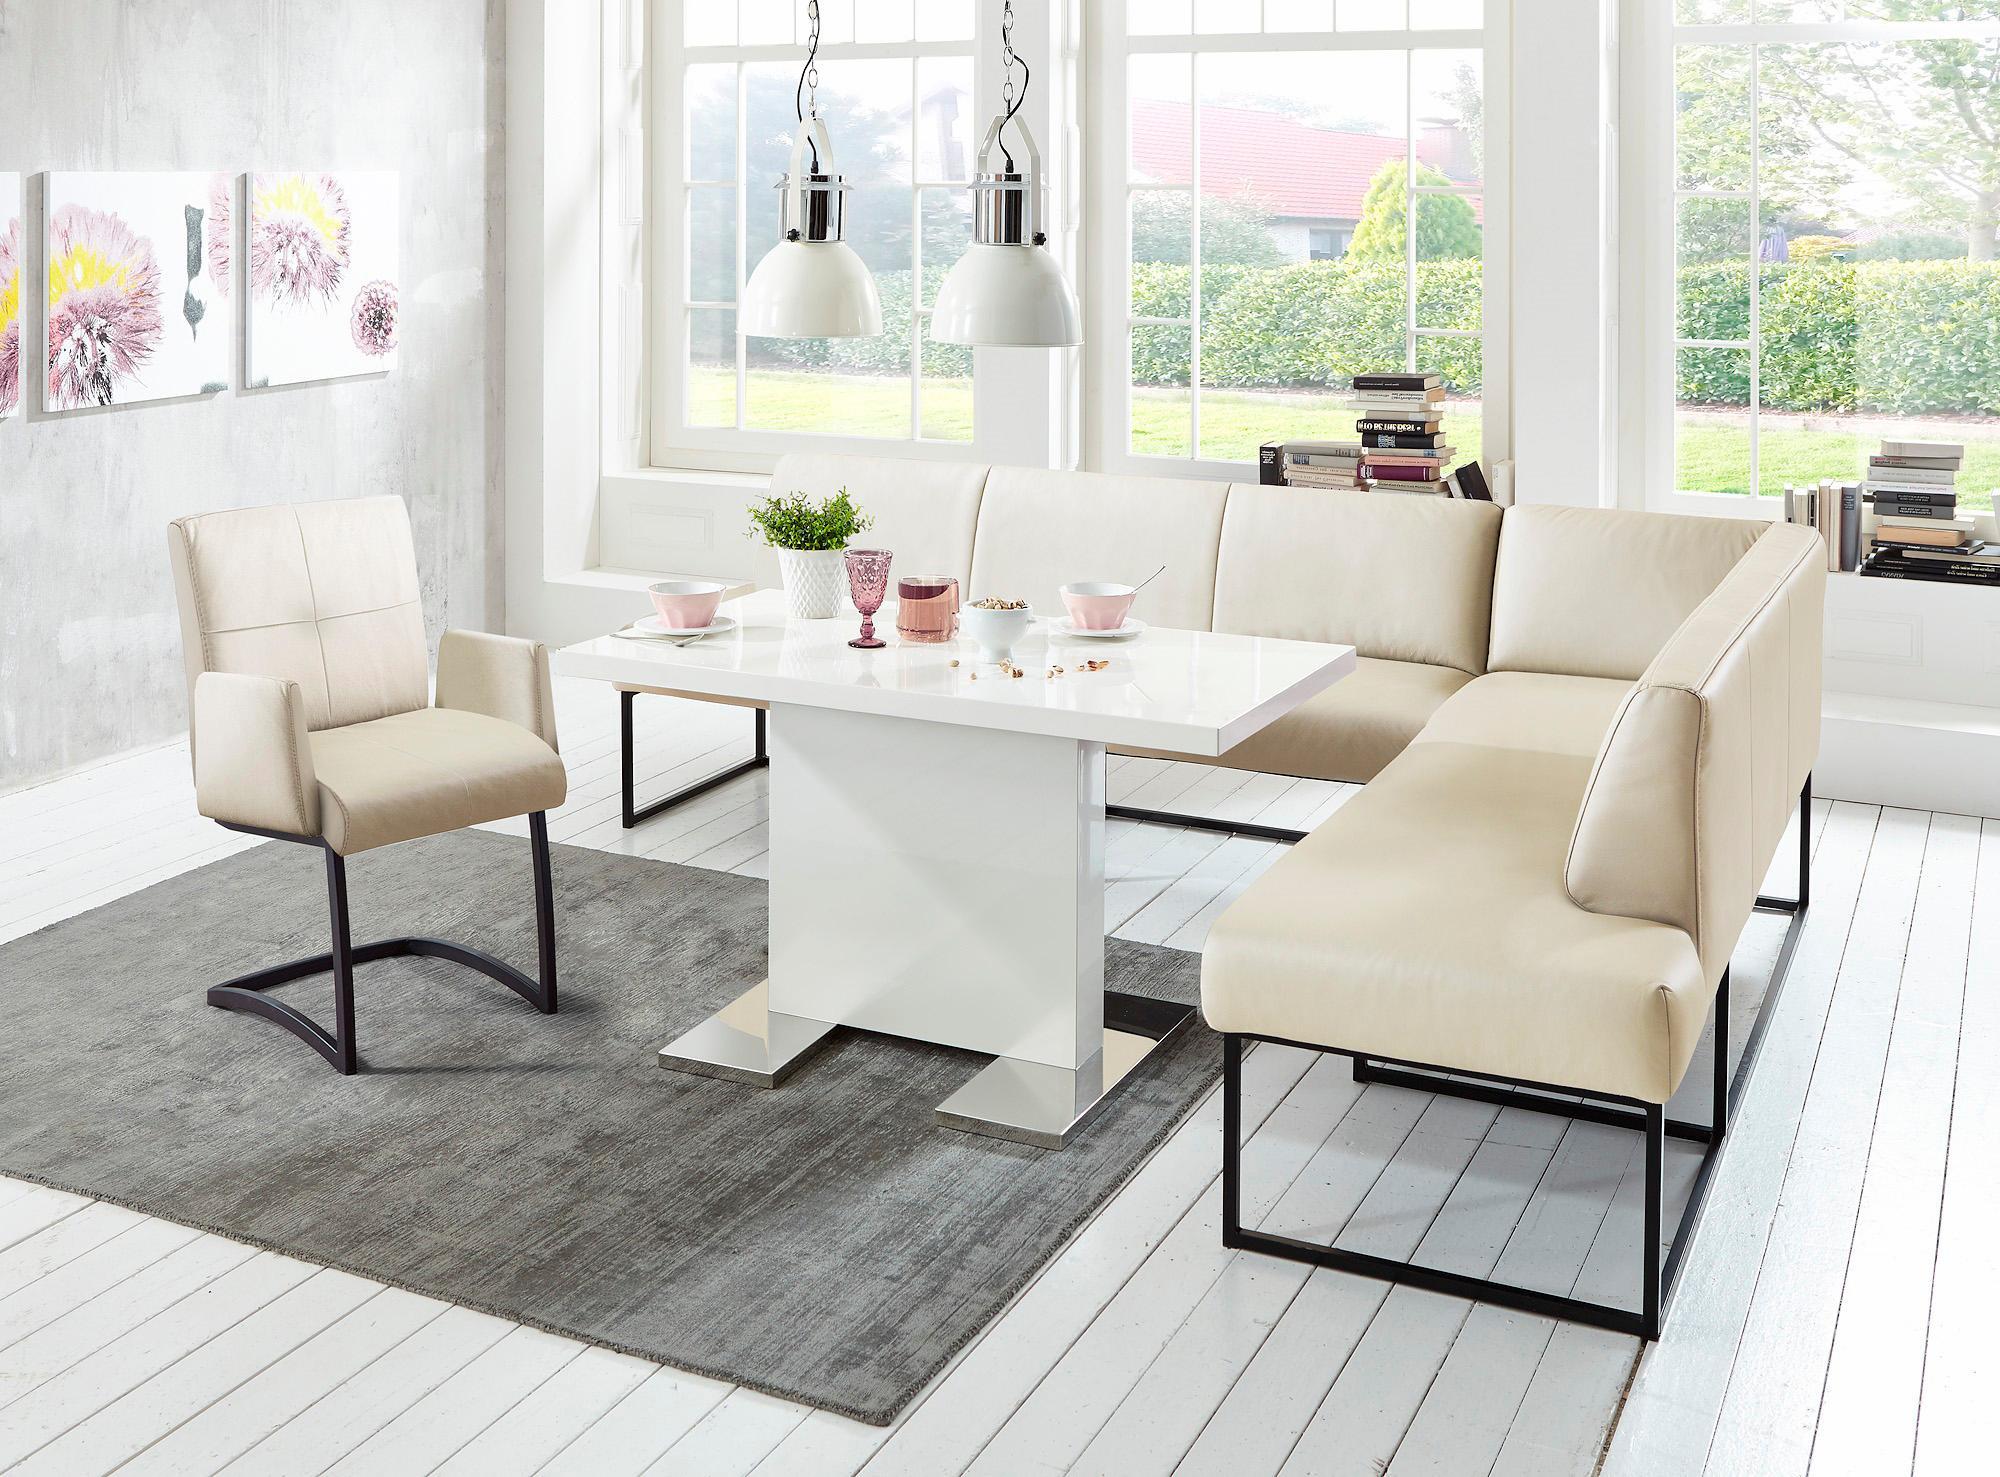 exxpo - sofa fashion Eckbank   Küche und Esszimmer > Sitzbänke > Eckbänke   EXXPO - SOFA FASHION